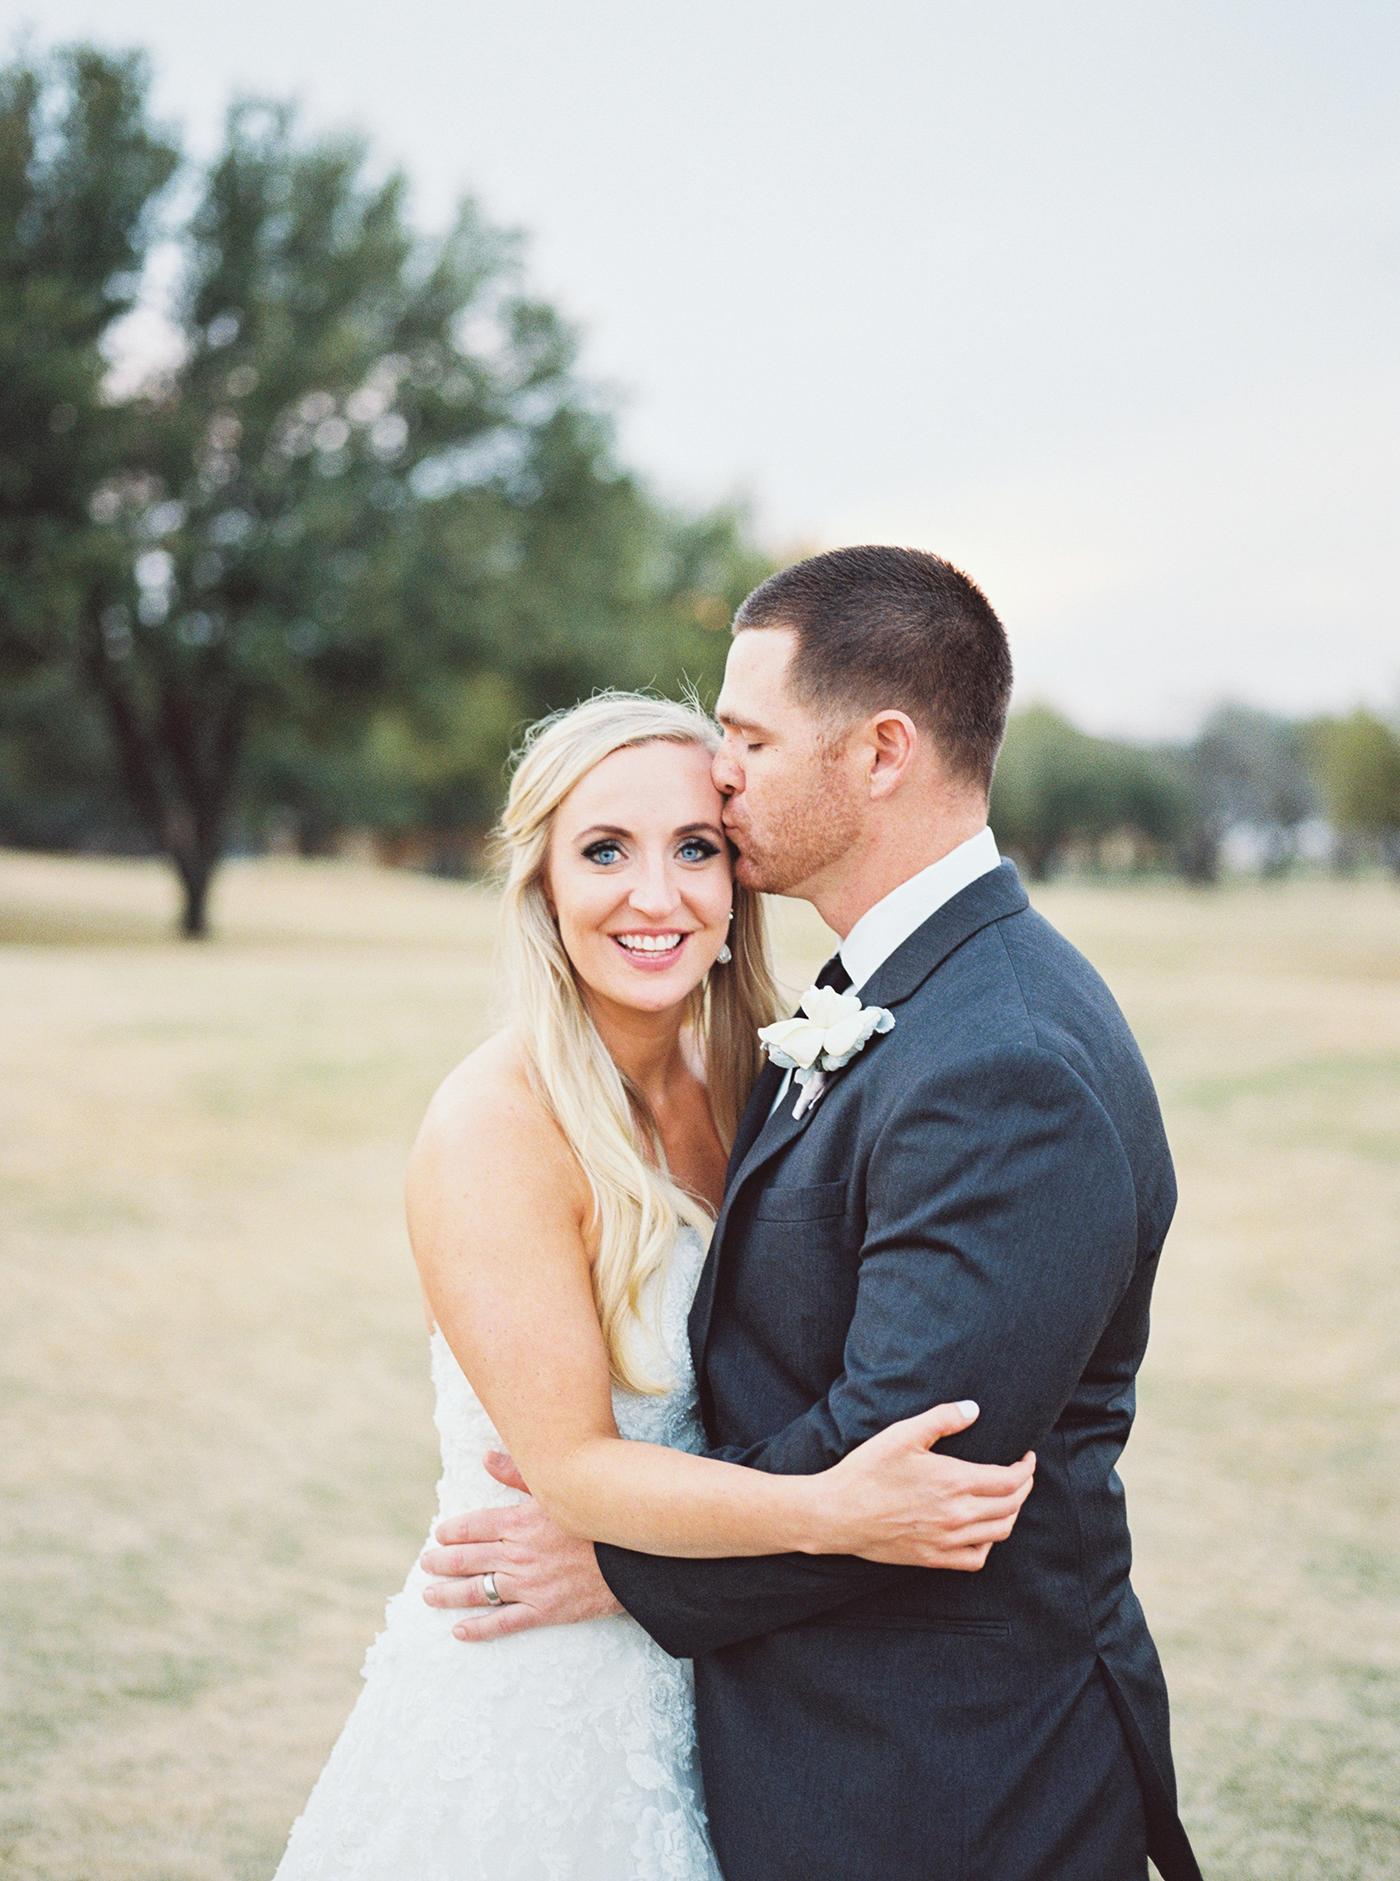 DFW Wedding Planner - Caroline + Jeff at The Four Seasons Hotel Wedding - Allday Events - 133.jpg